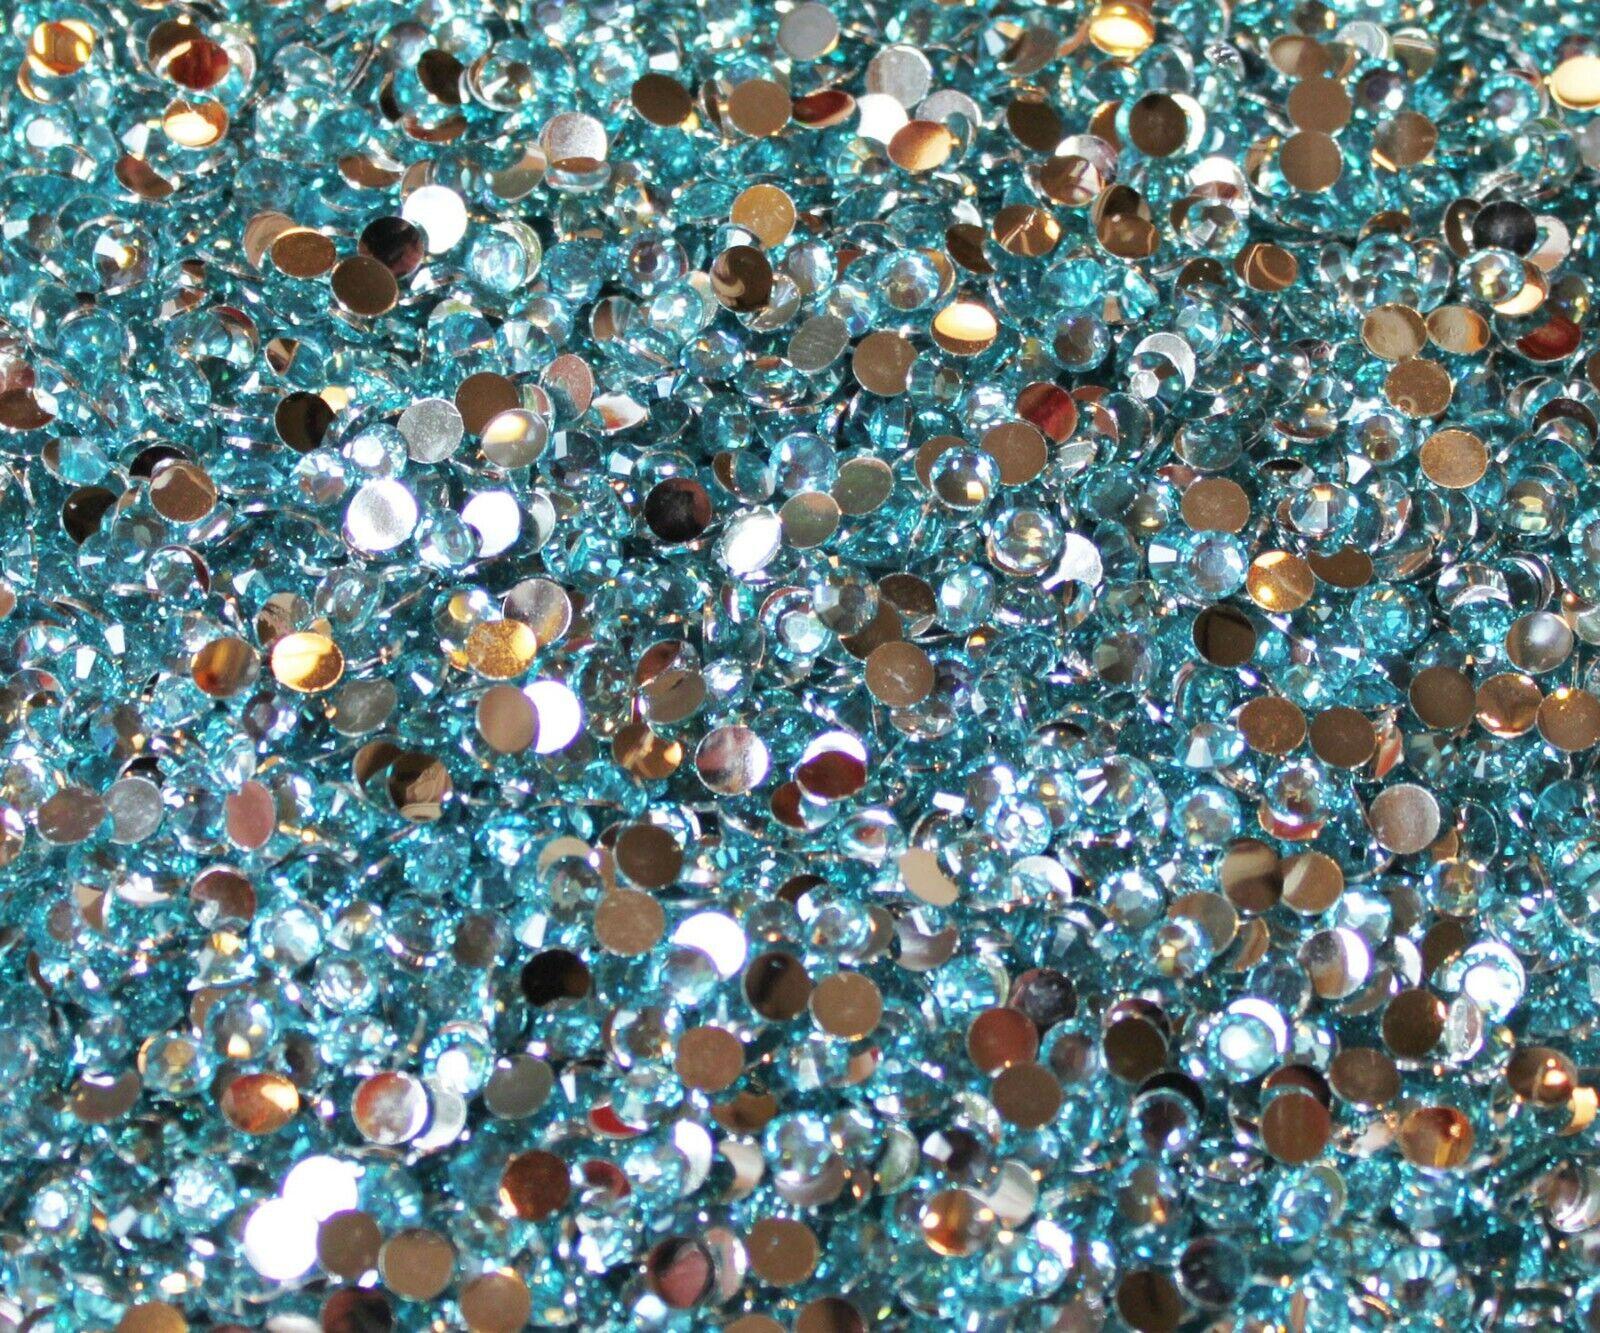 1000 Crystal Flat Back Resin Rhinestones Gems 60 colors, 2mm, 3mm, 4mm, 5mm, 6.5 AQUAMARINE